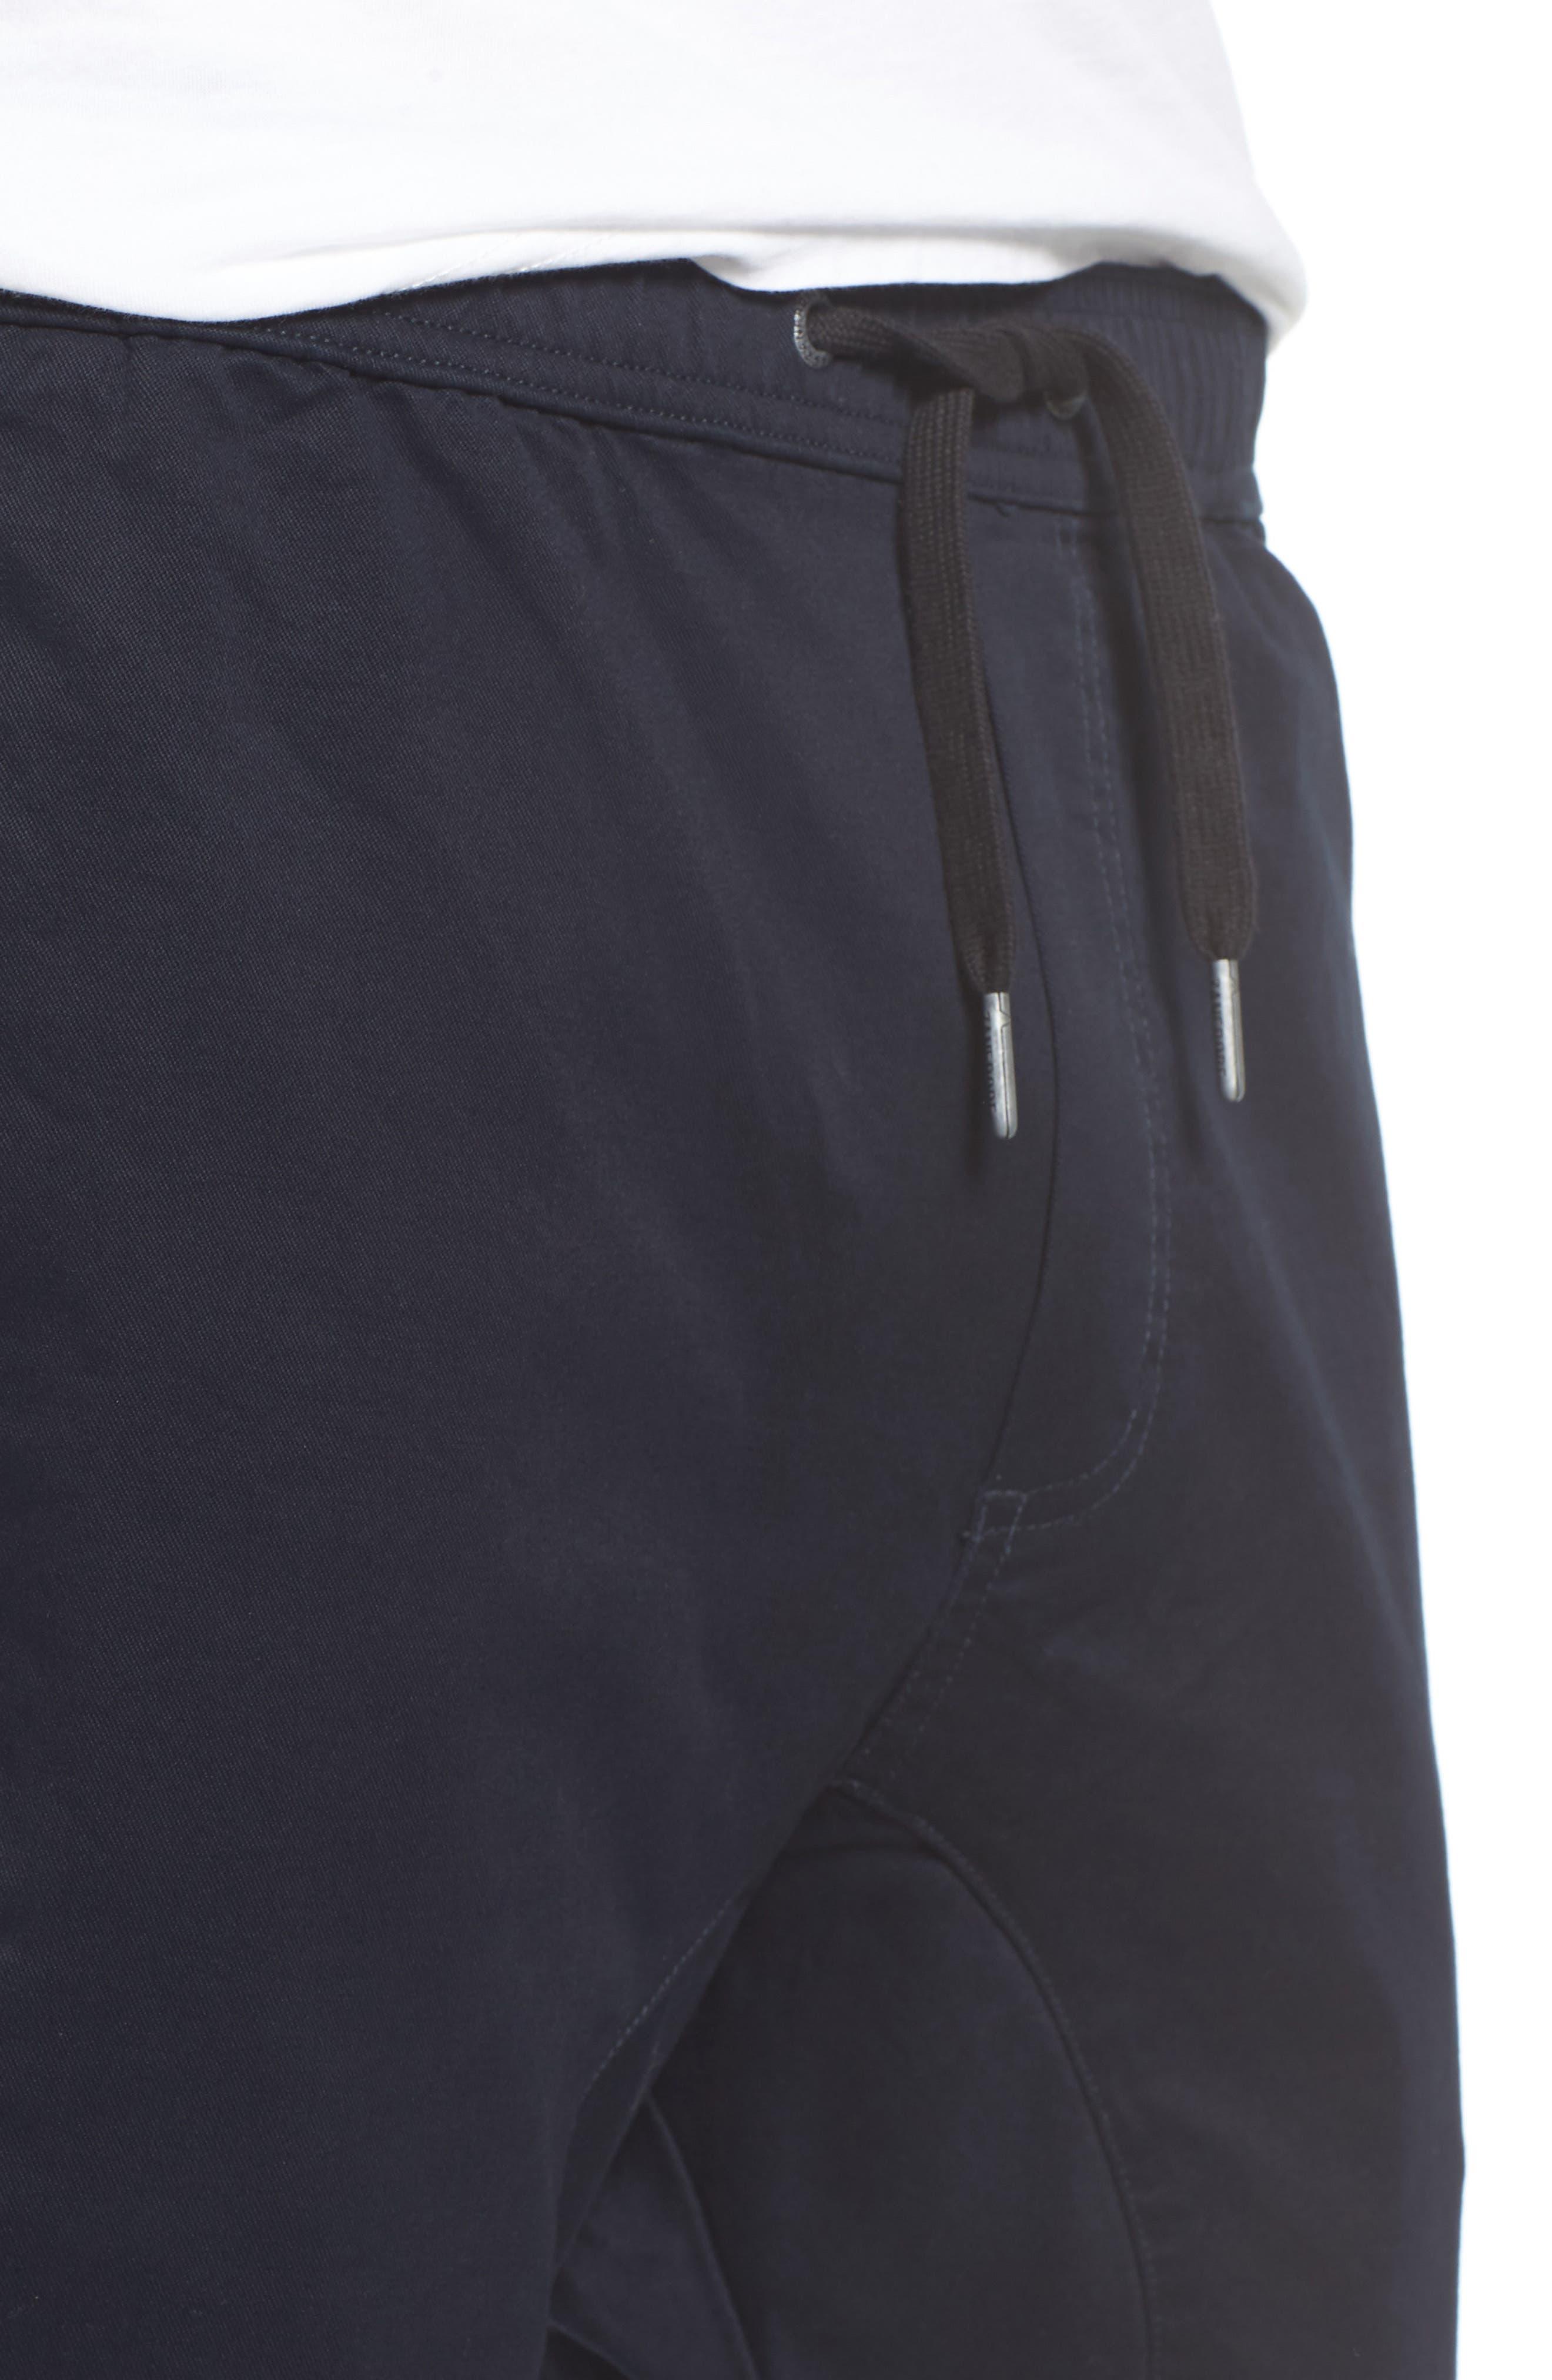 ZANEROBE,                             Salerno Stretch Woven Jogger Pants,                             Alternate thumbnail 4, color,                             NAVY